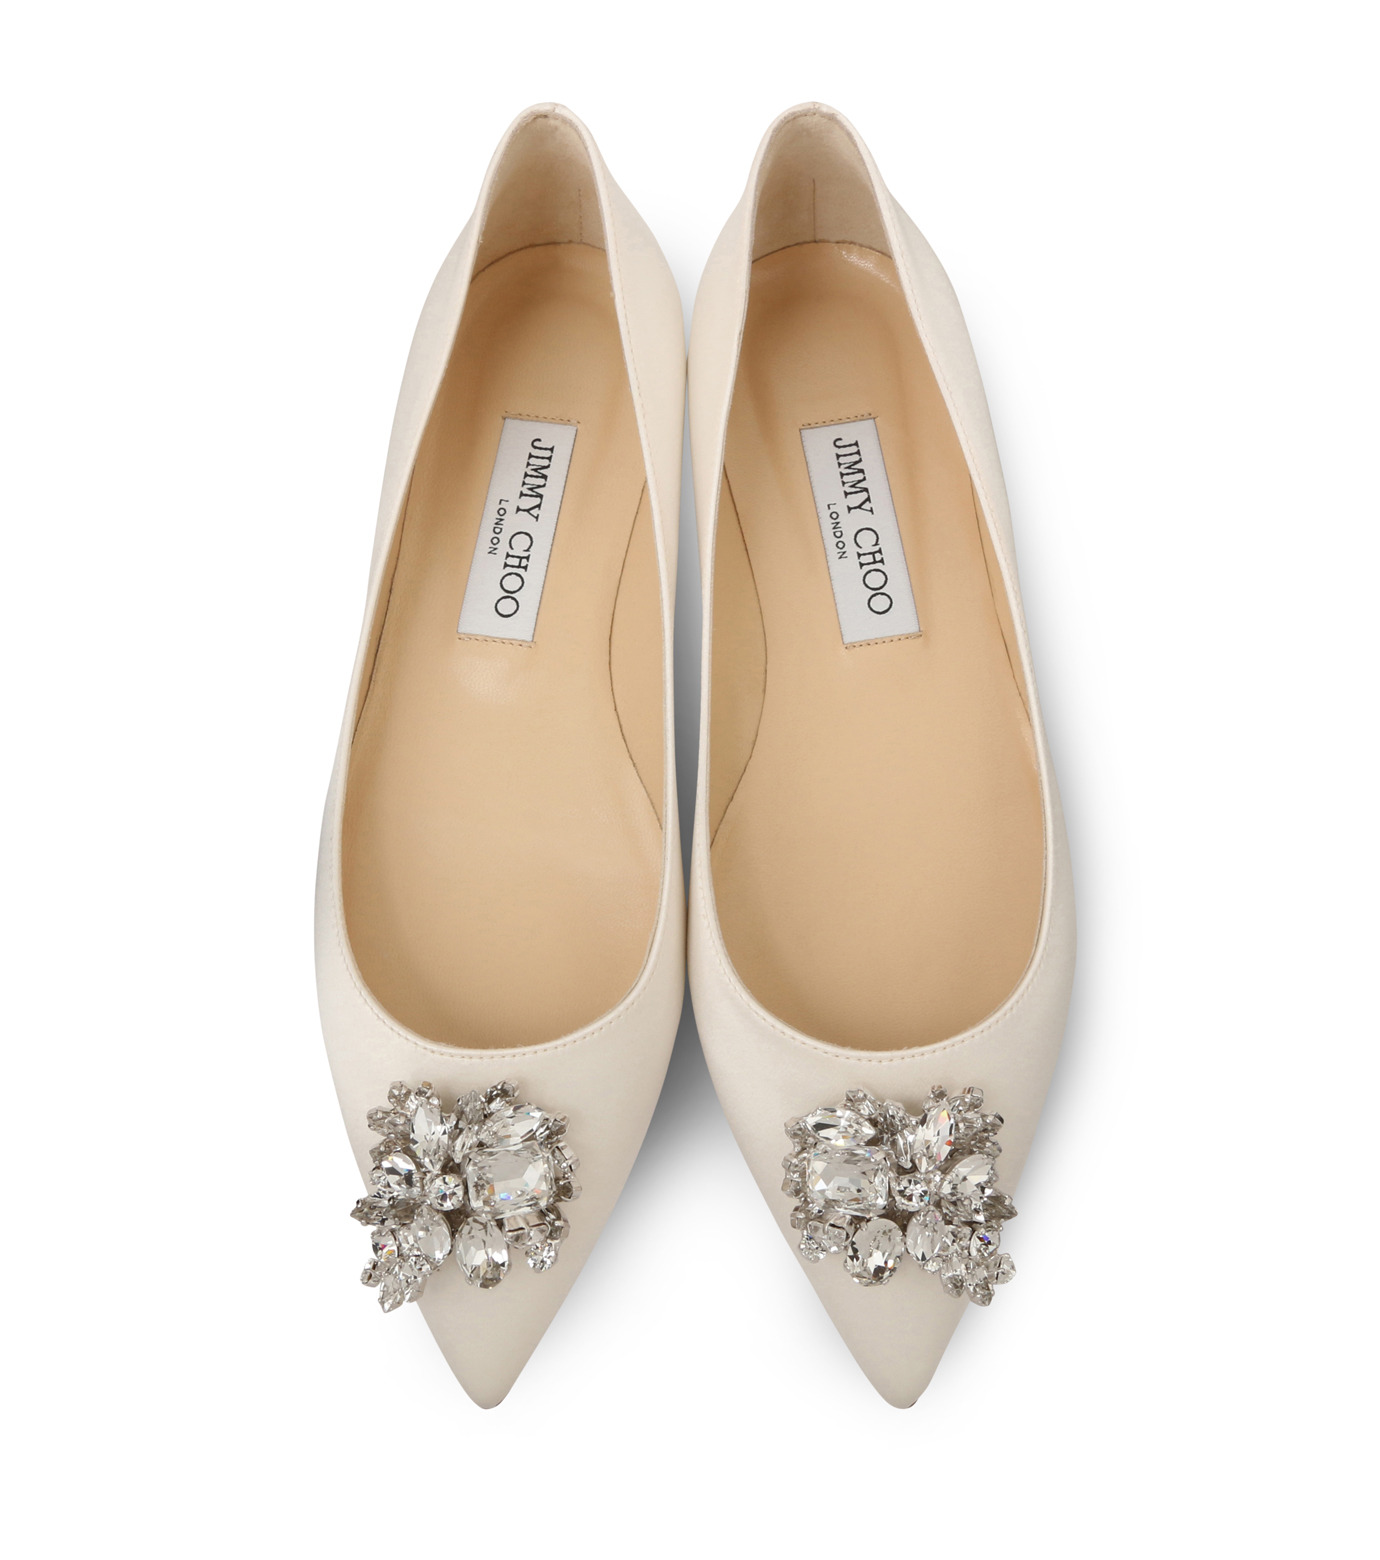 Jimmy Choo(ジミーチュウ)の010STV Satin Flat w/Crystal Brooch-WHITE(フラットシューズ/Flat shoes)-ALINA-5 拡大詳細画像4